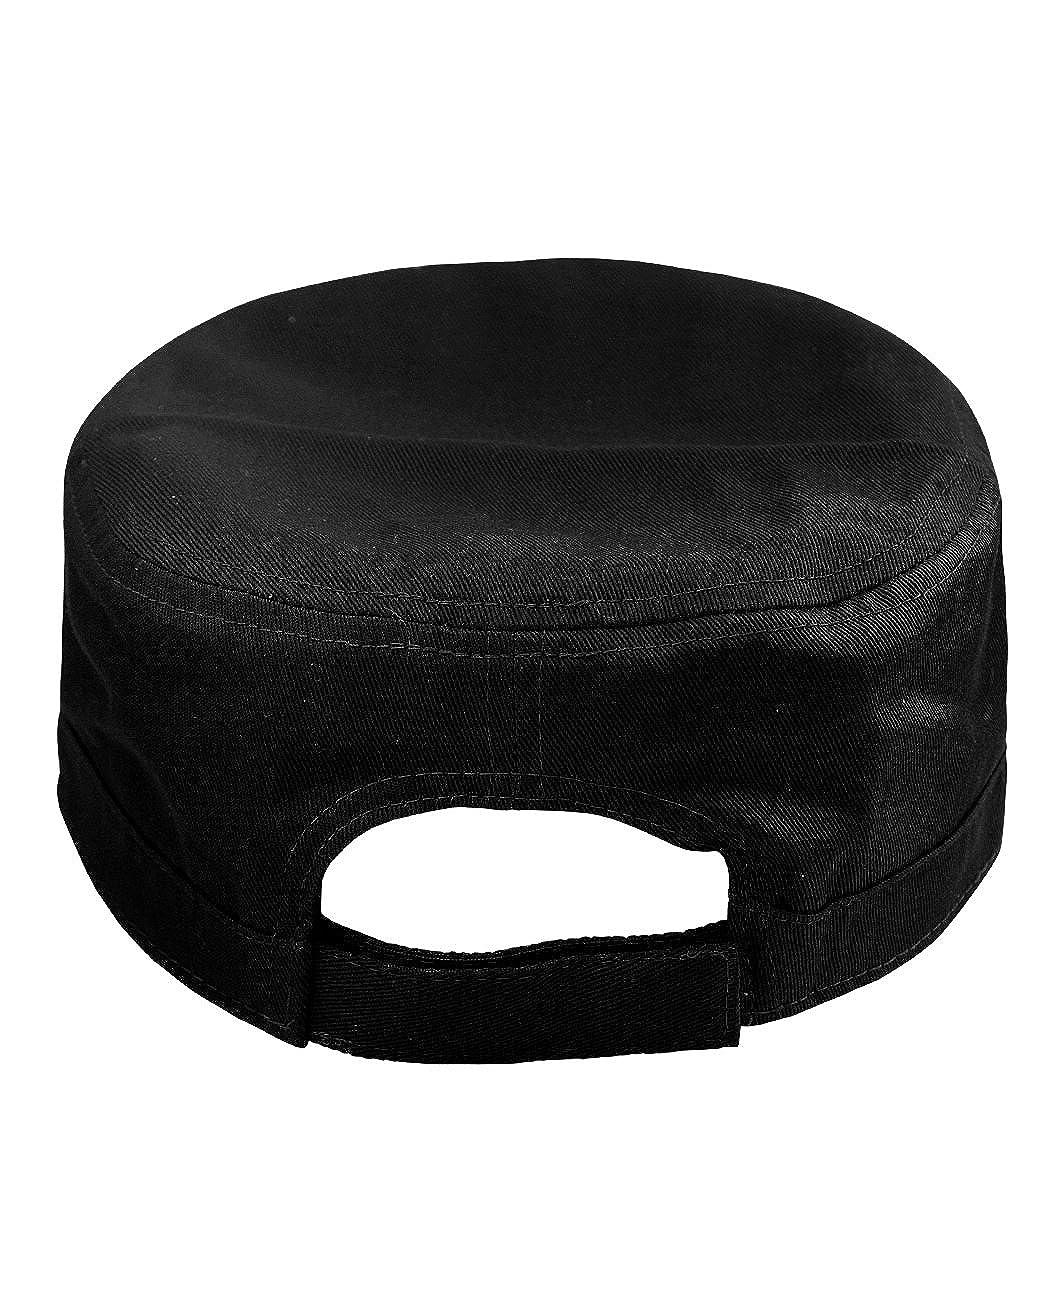 NYFASHION101 Fashionable Solid Color Unisex Adjustable Velcro Strap Cadet Cap